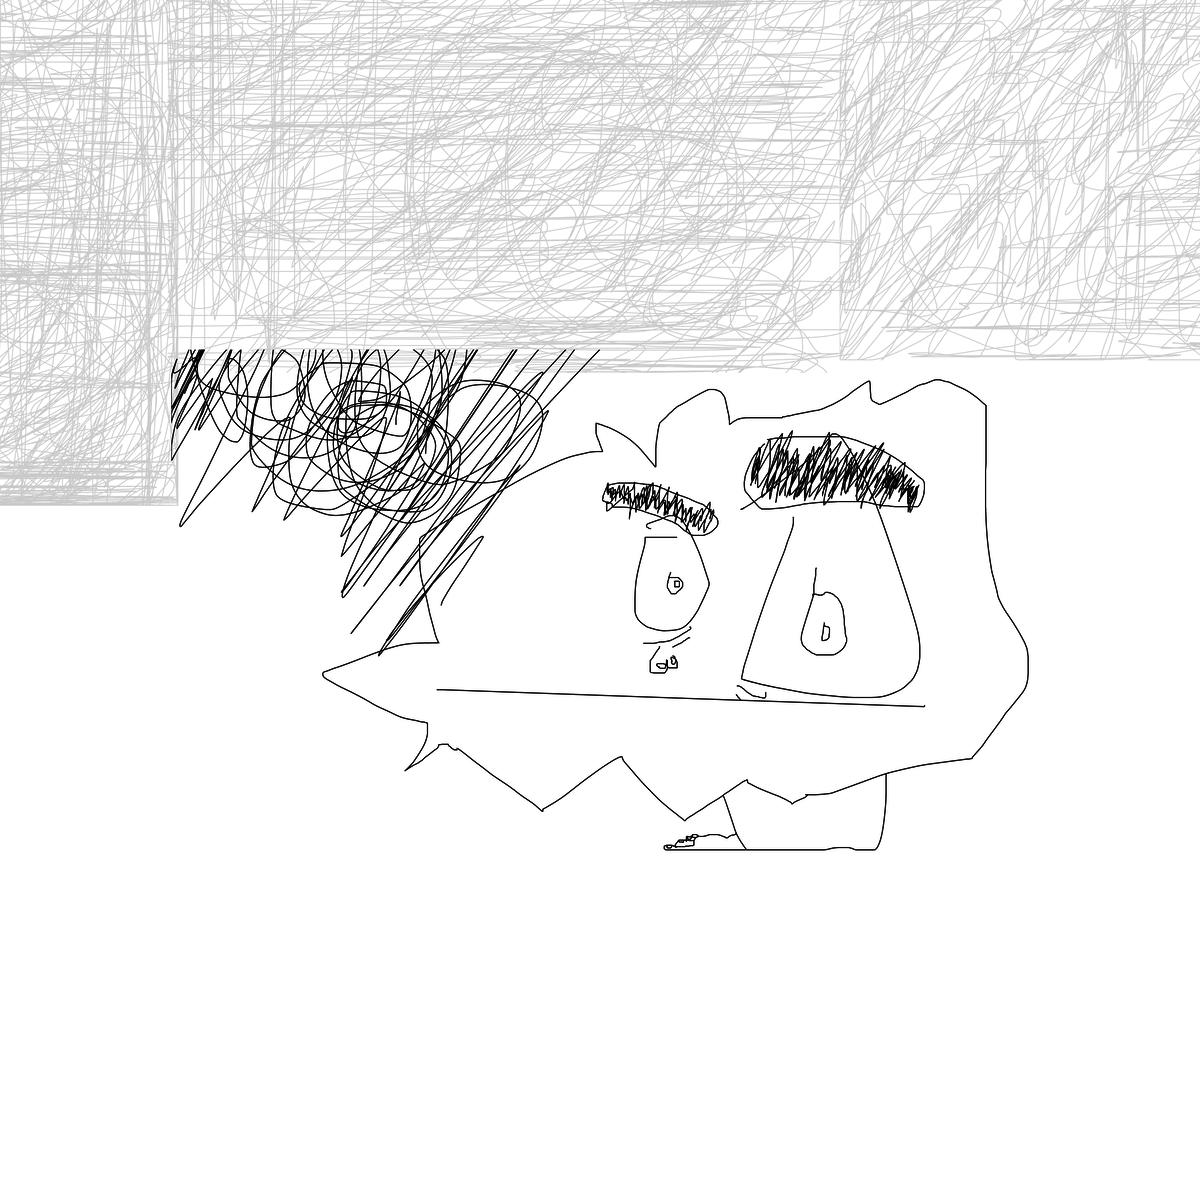 BAAAM drawing#24118 lat:46.5208129882812500lng: 6.6338477134704590